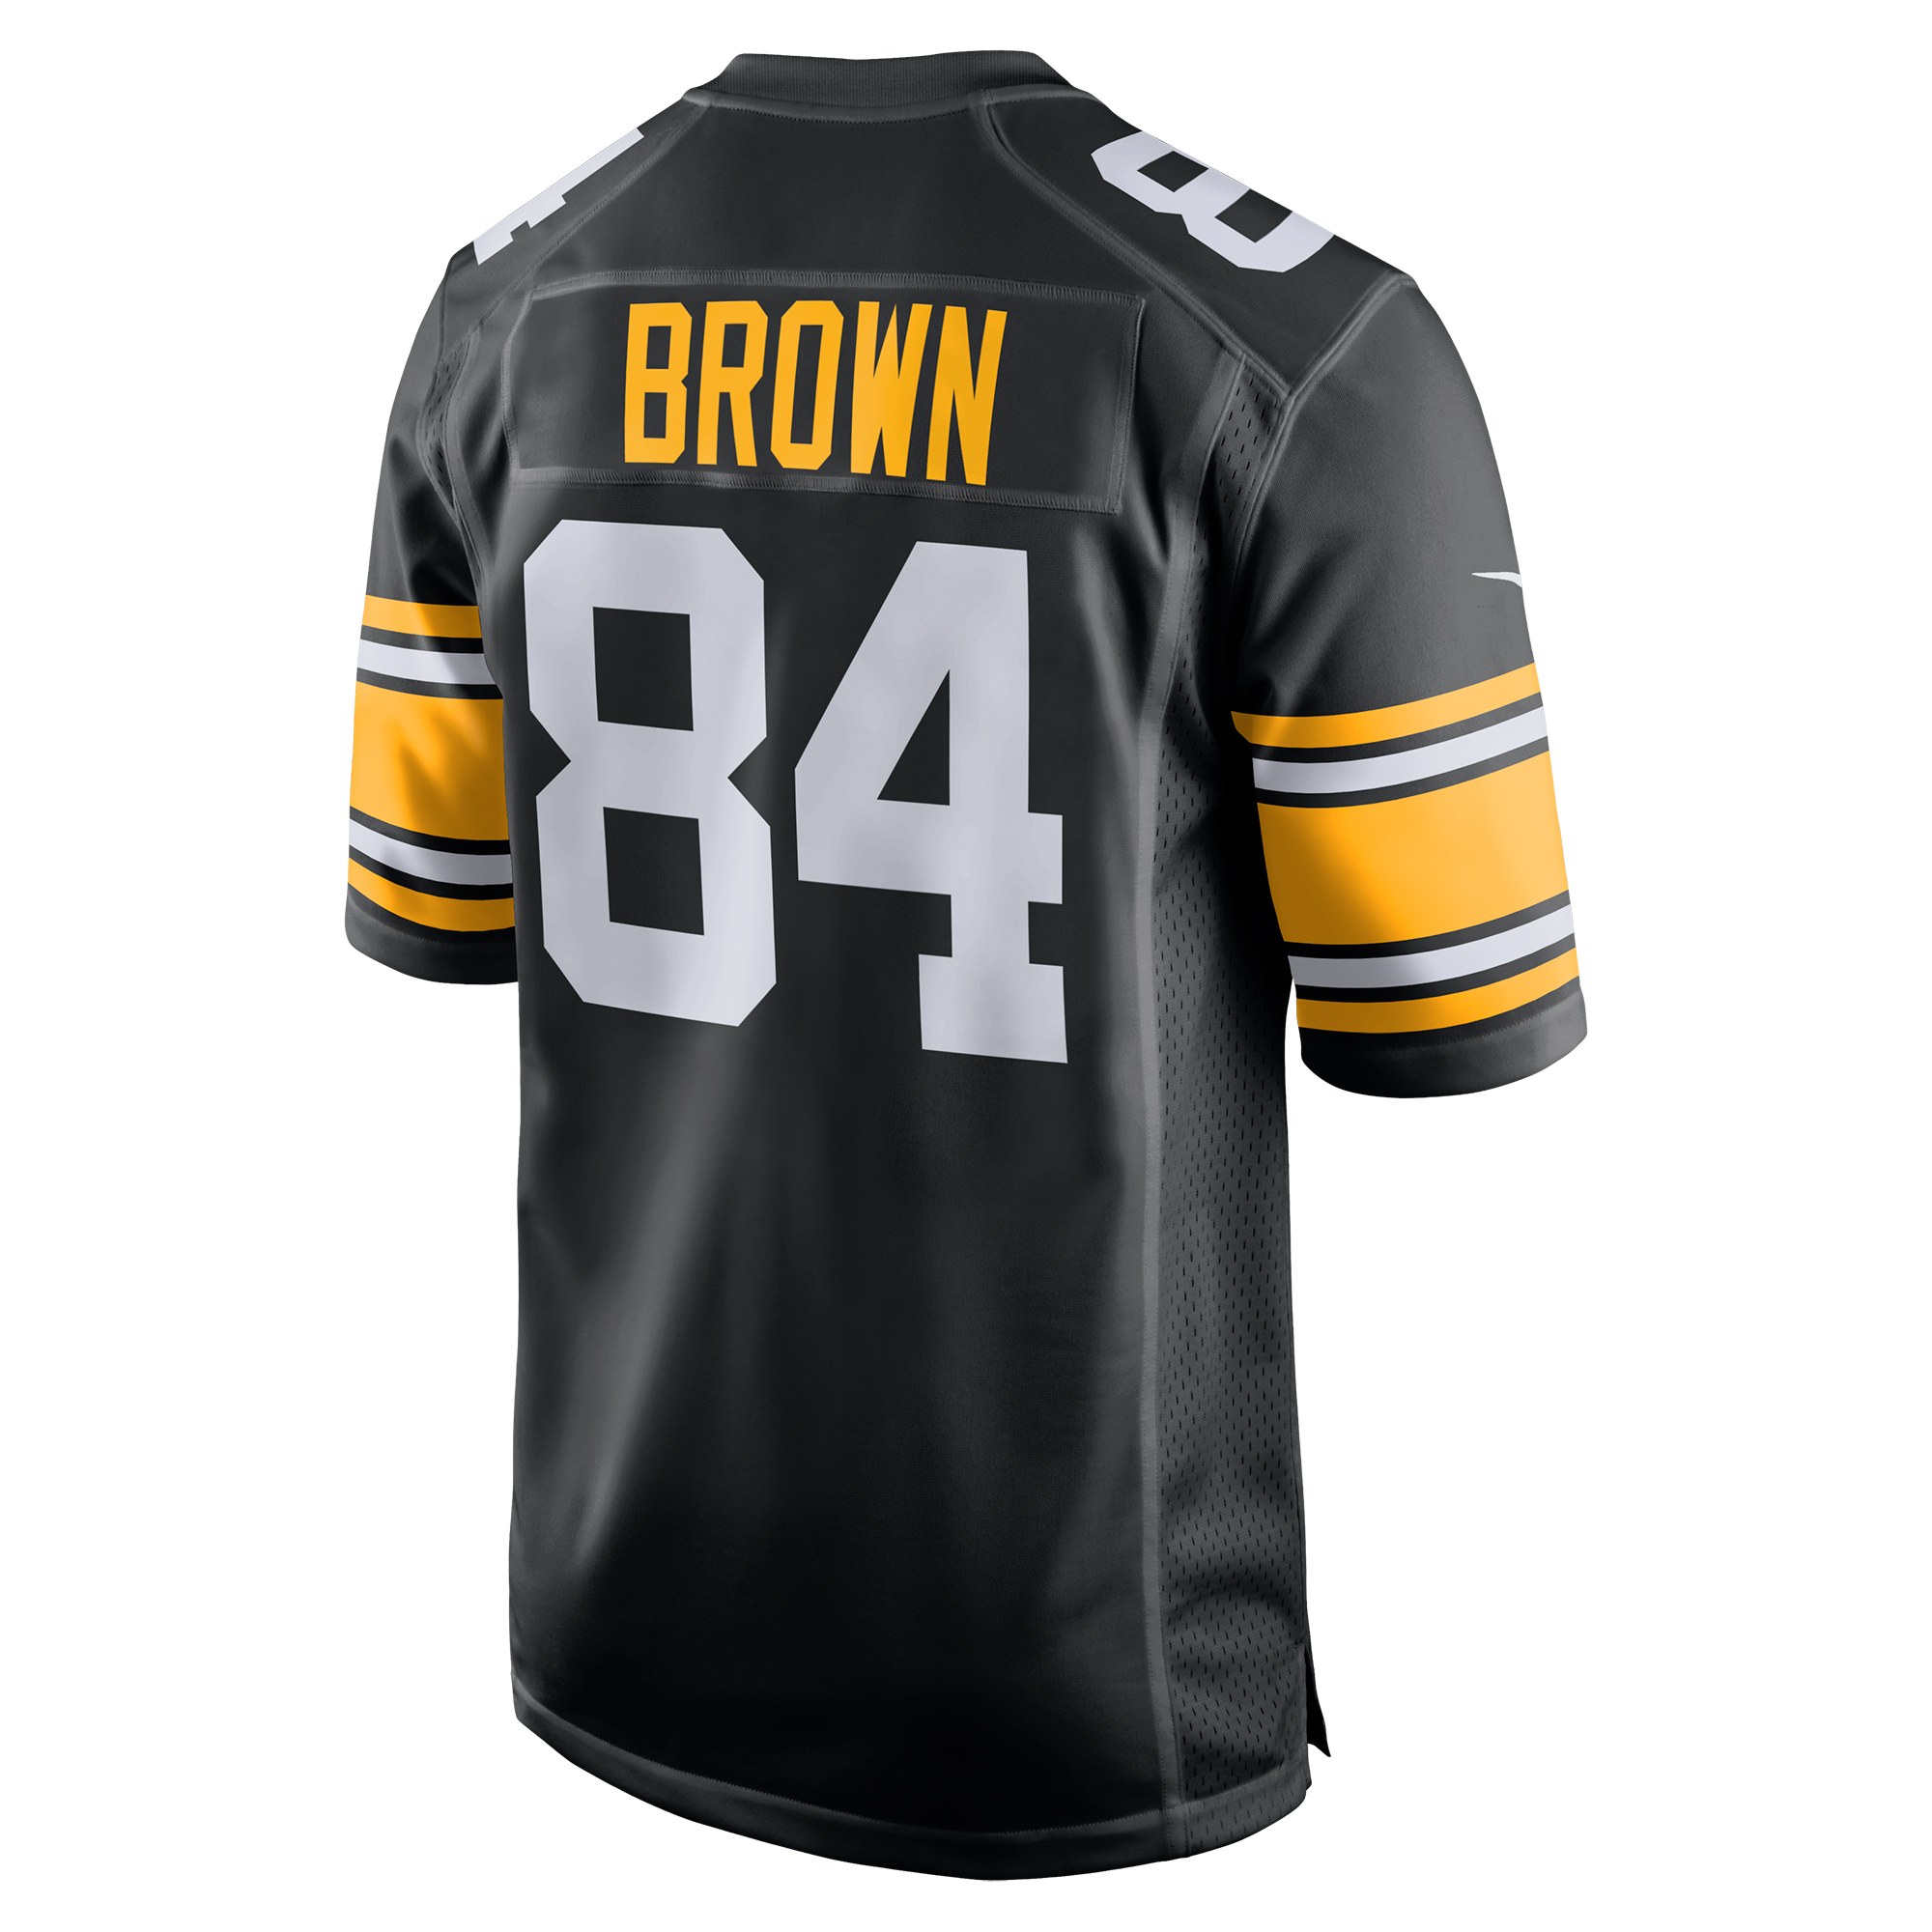 b12c69de8 Antonio Brown Pittsburgh Steelers Nike Youth Alternate Game Jersey - Black  - Walmart.com